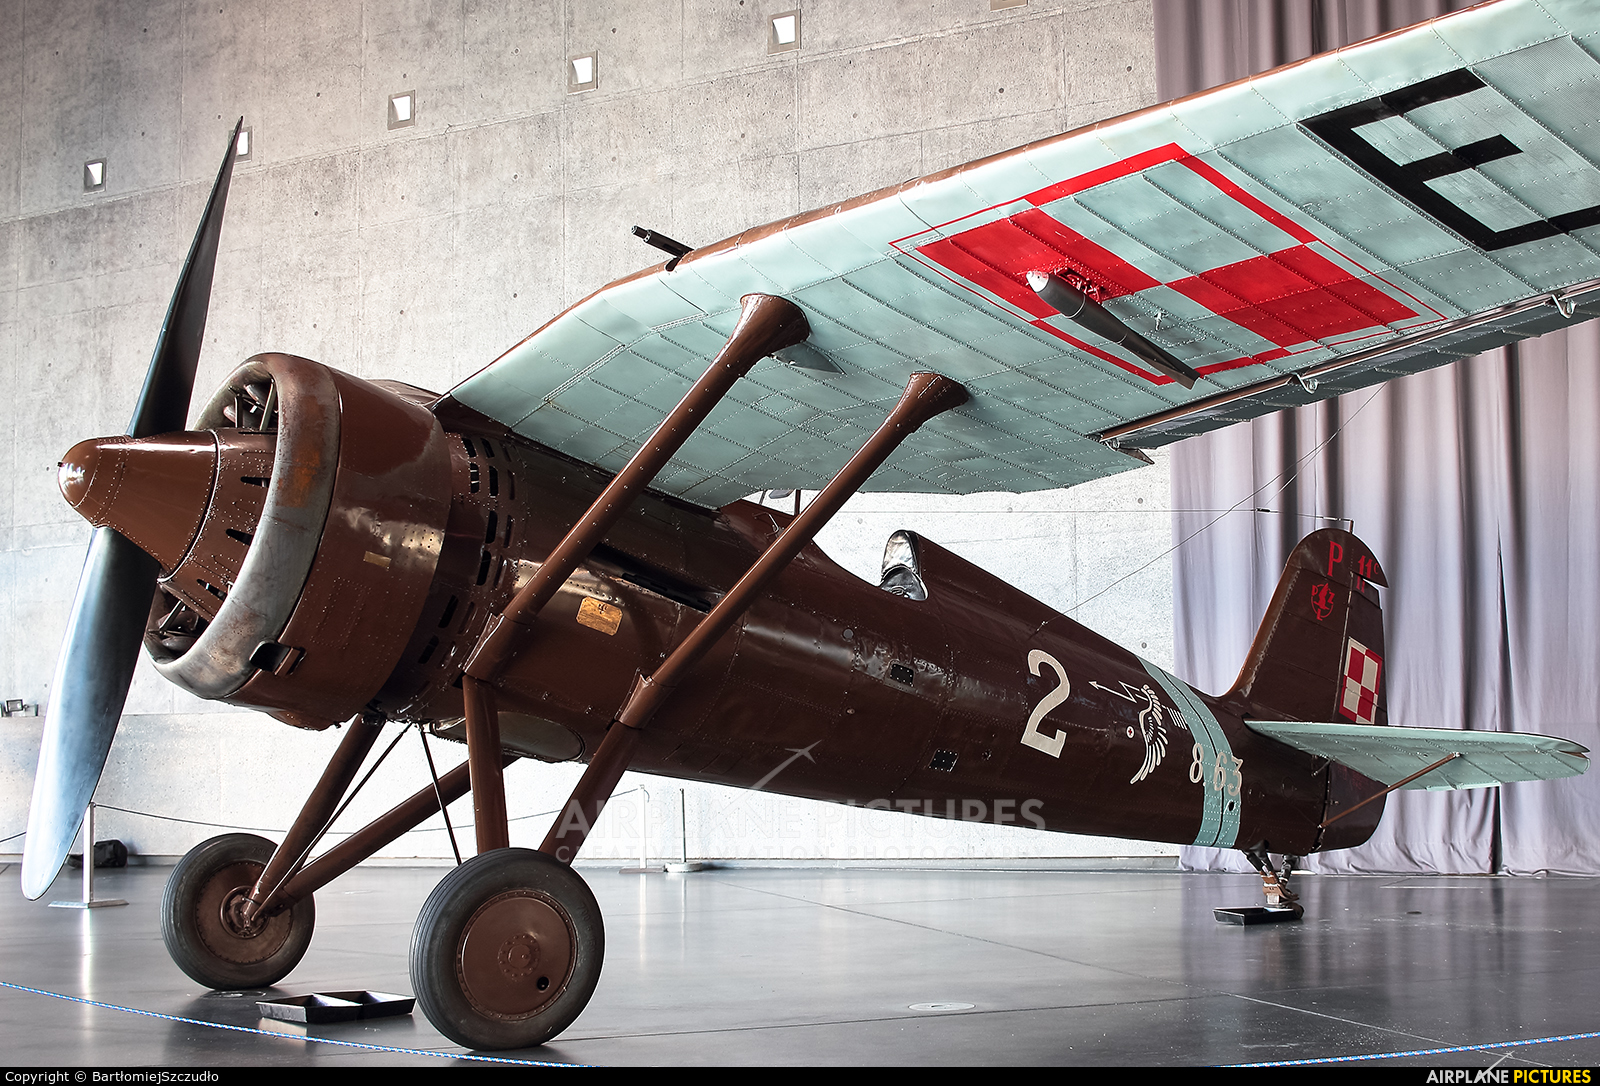 Museum of Polish Aviation 8.63 aircraft at Kraków, Rakowice Czyżyny - Museum of Polish Aviation